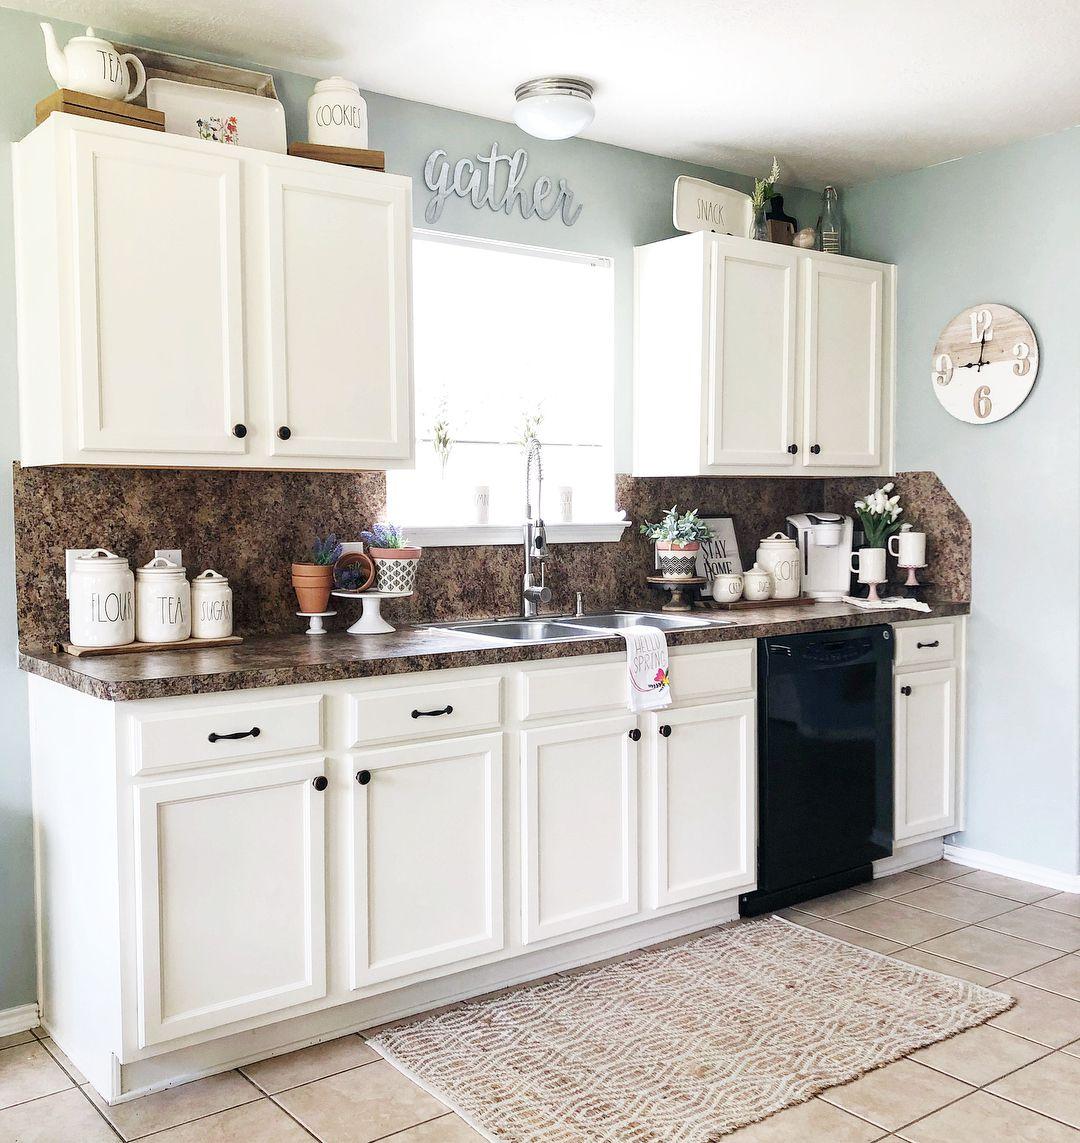 Modern Decorations For Above Kitchen Cabinets Novocom Top